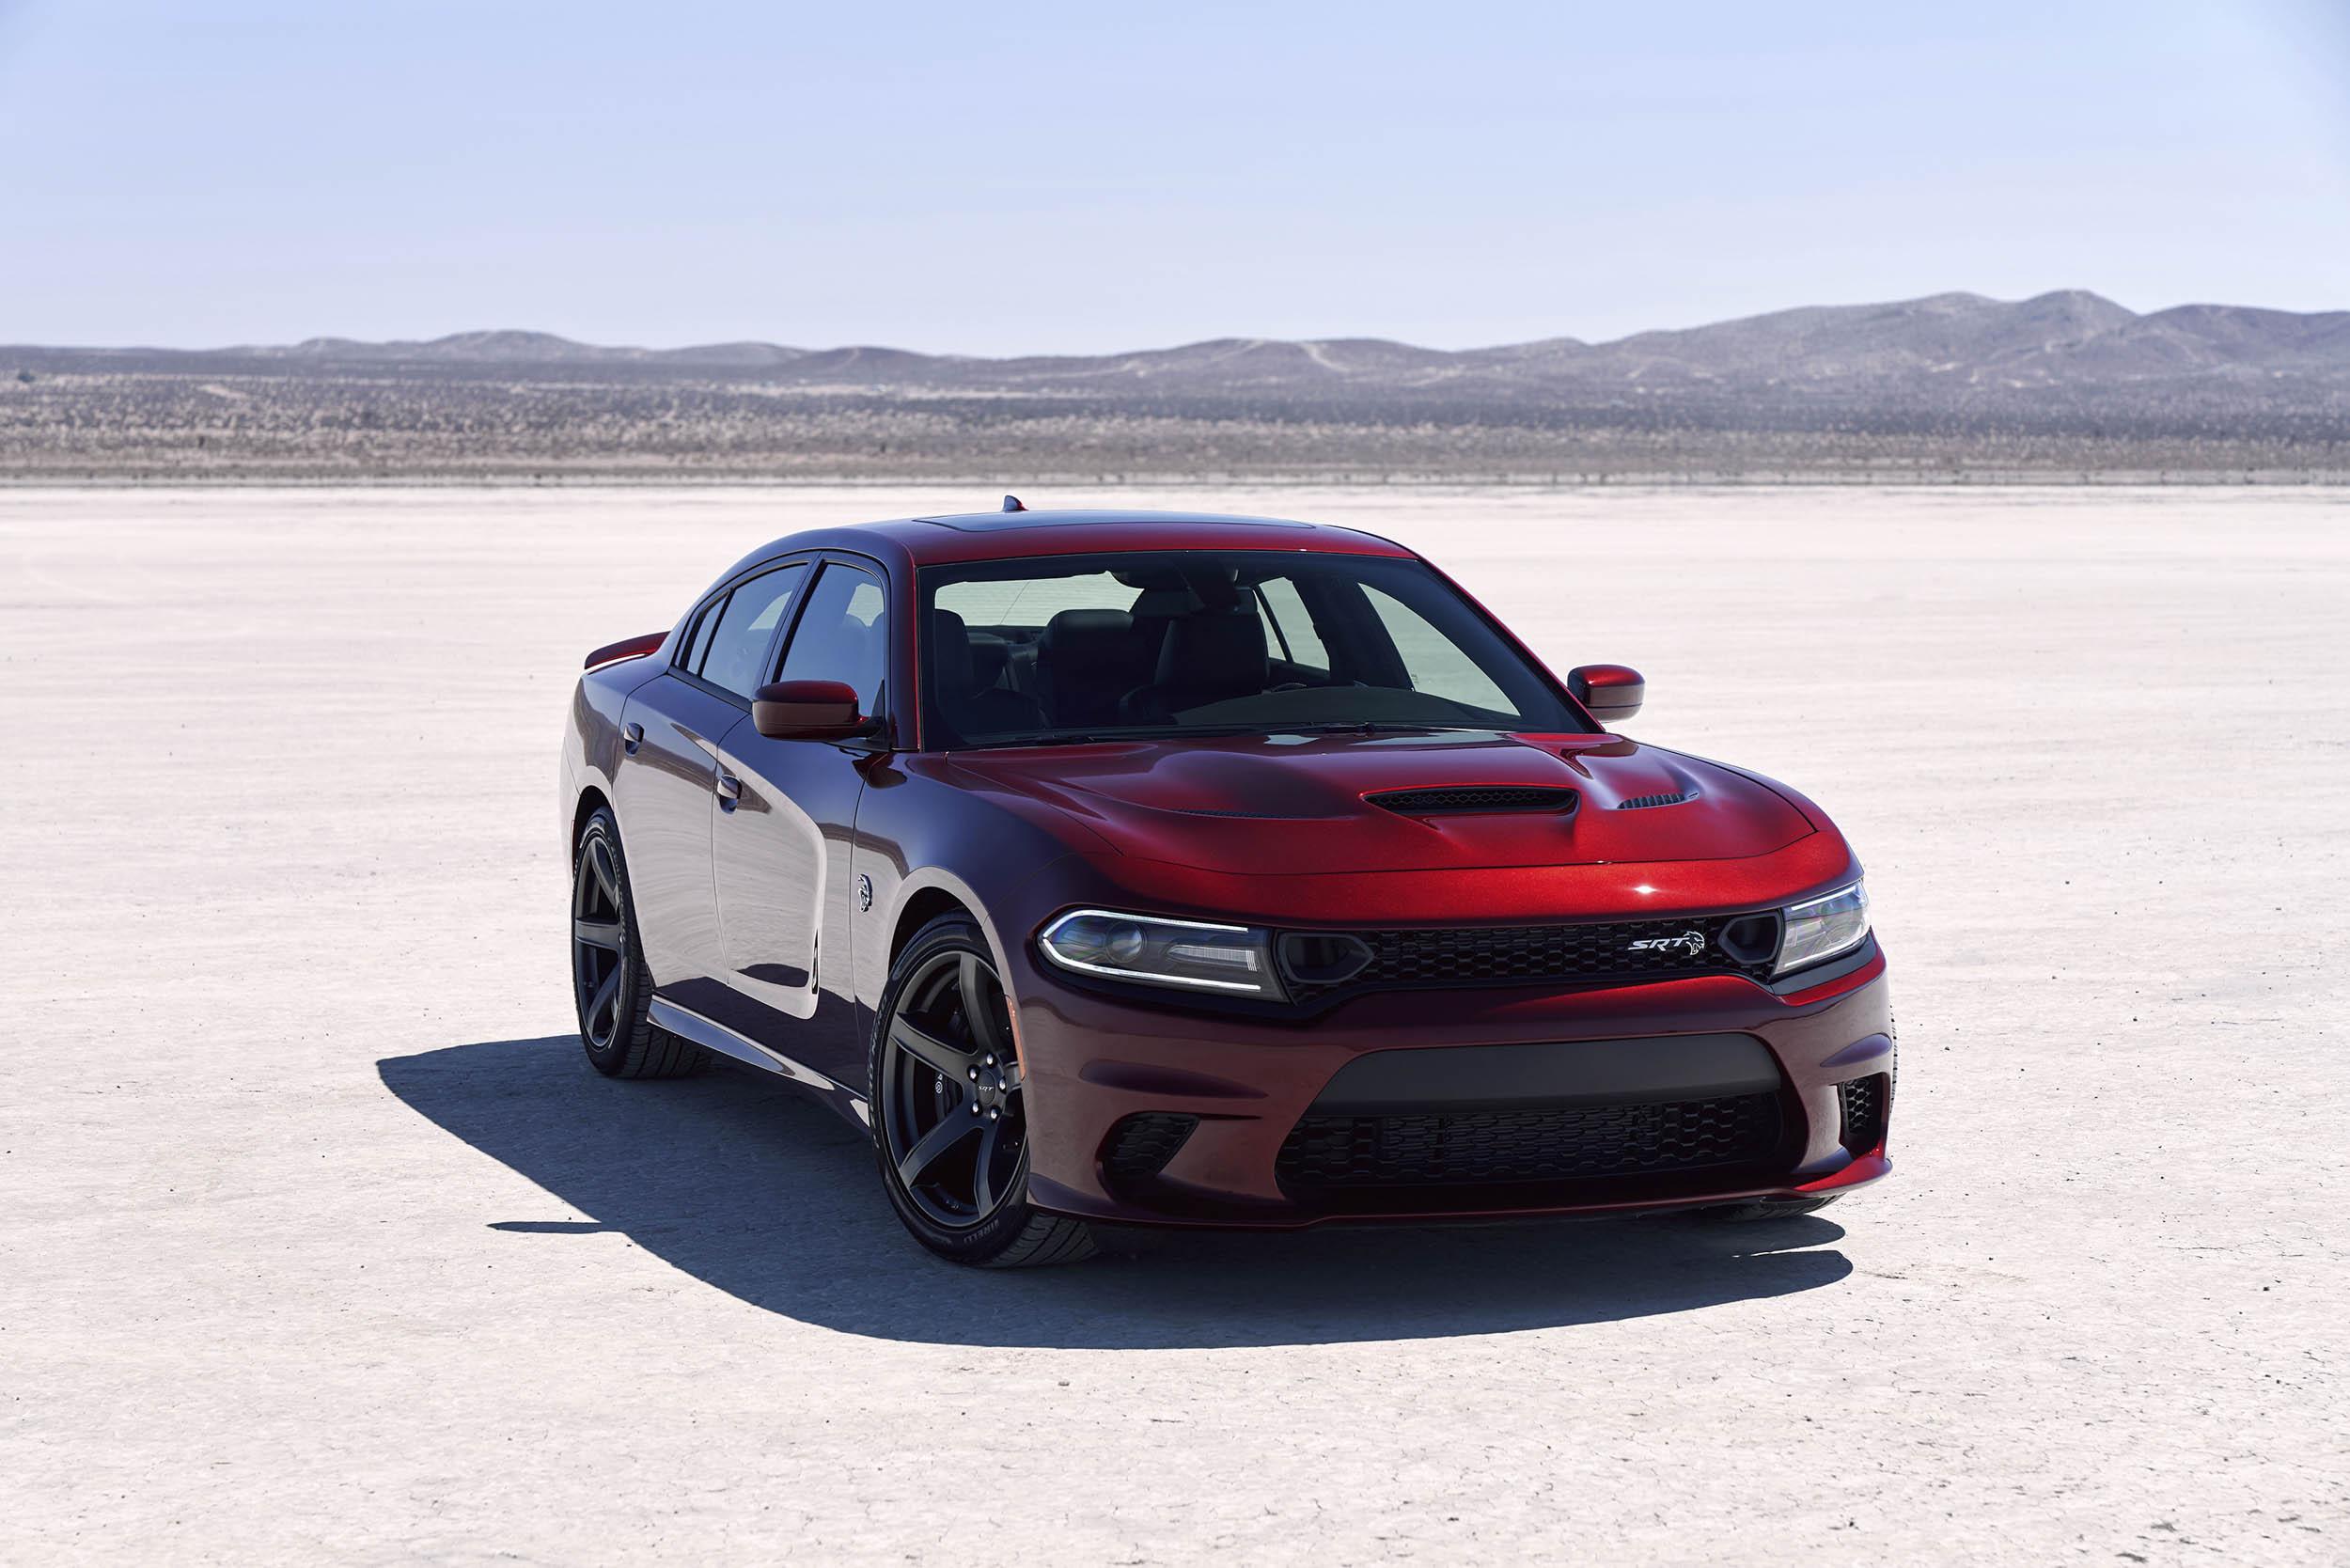 2019 Dodge Charger SRT Hellcat front 3/4